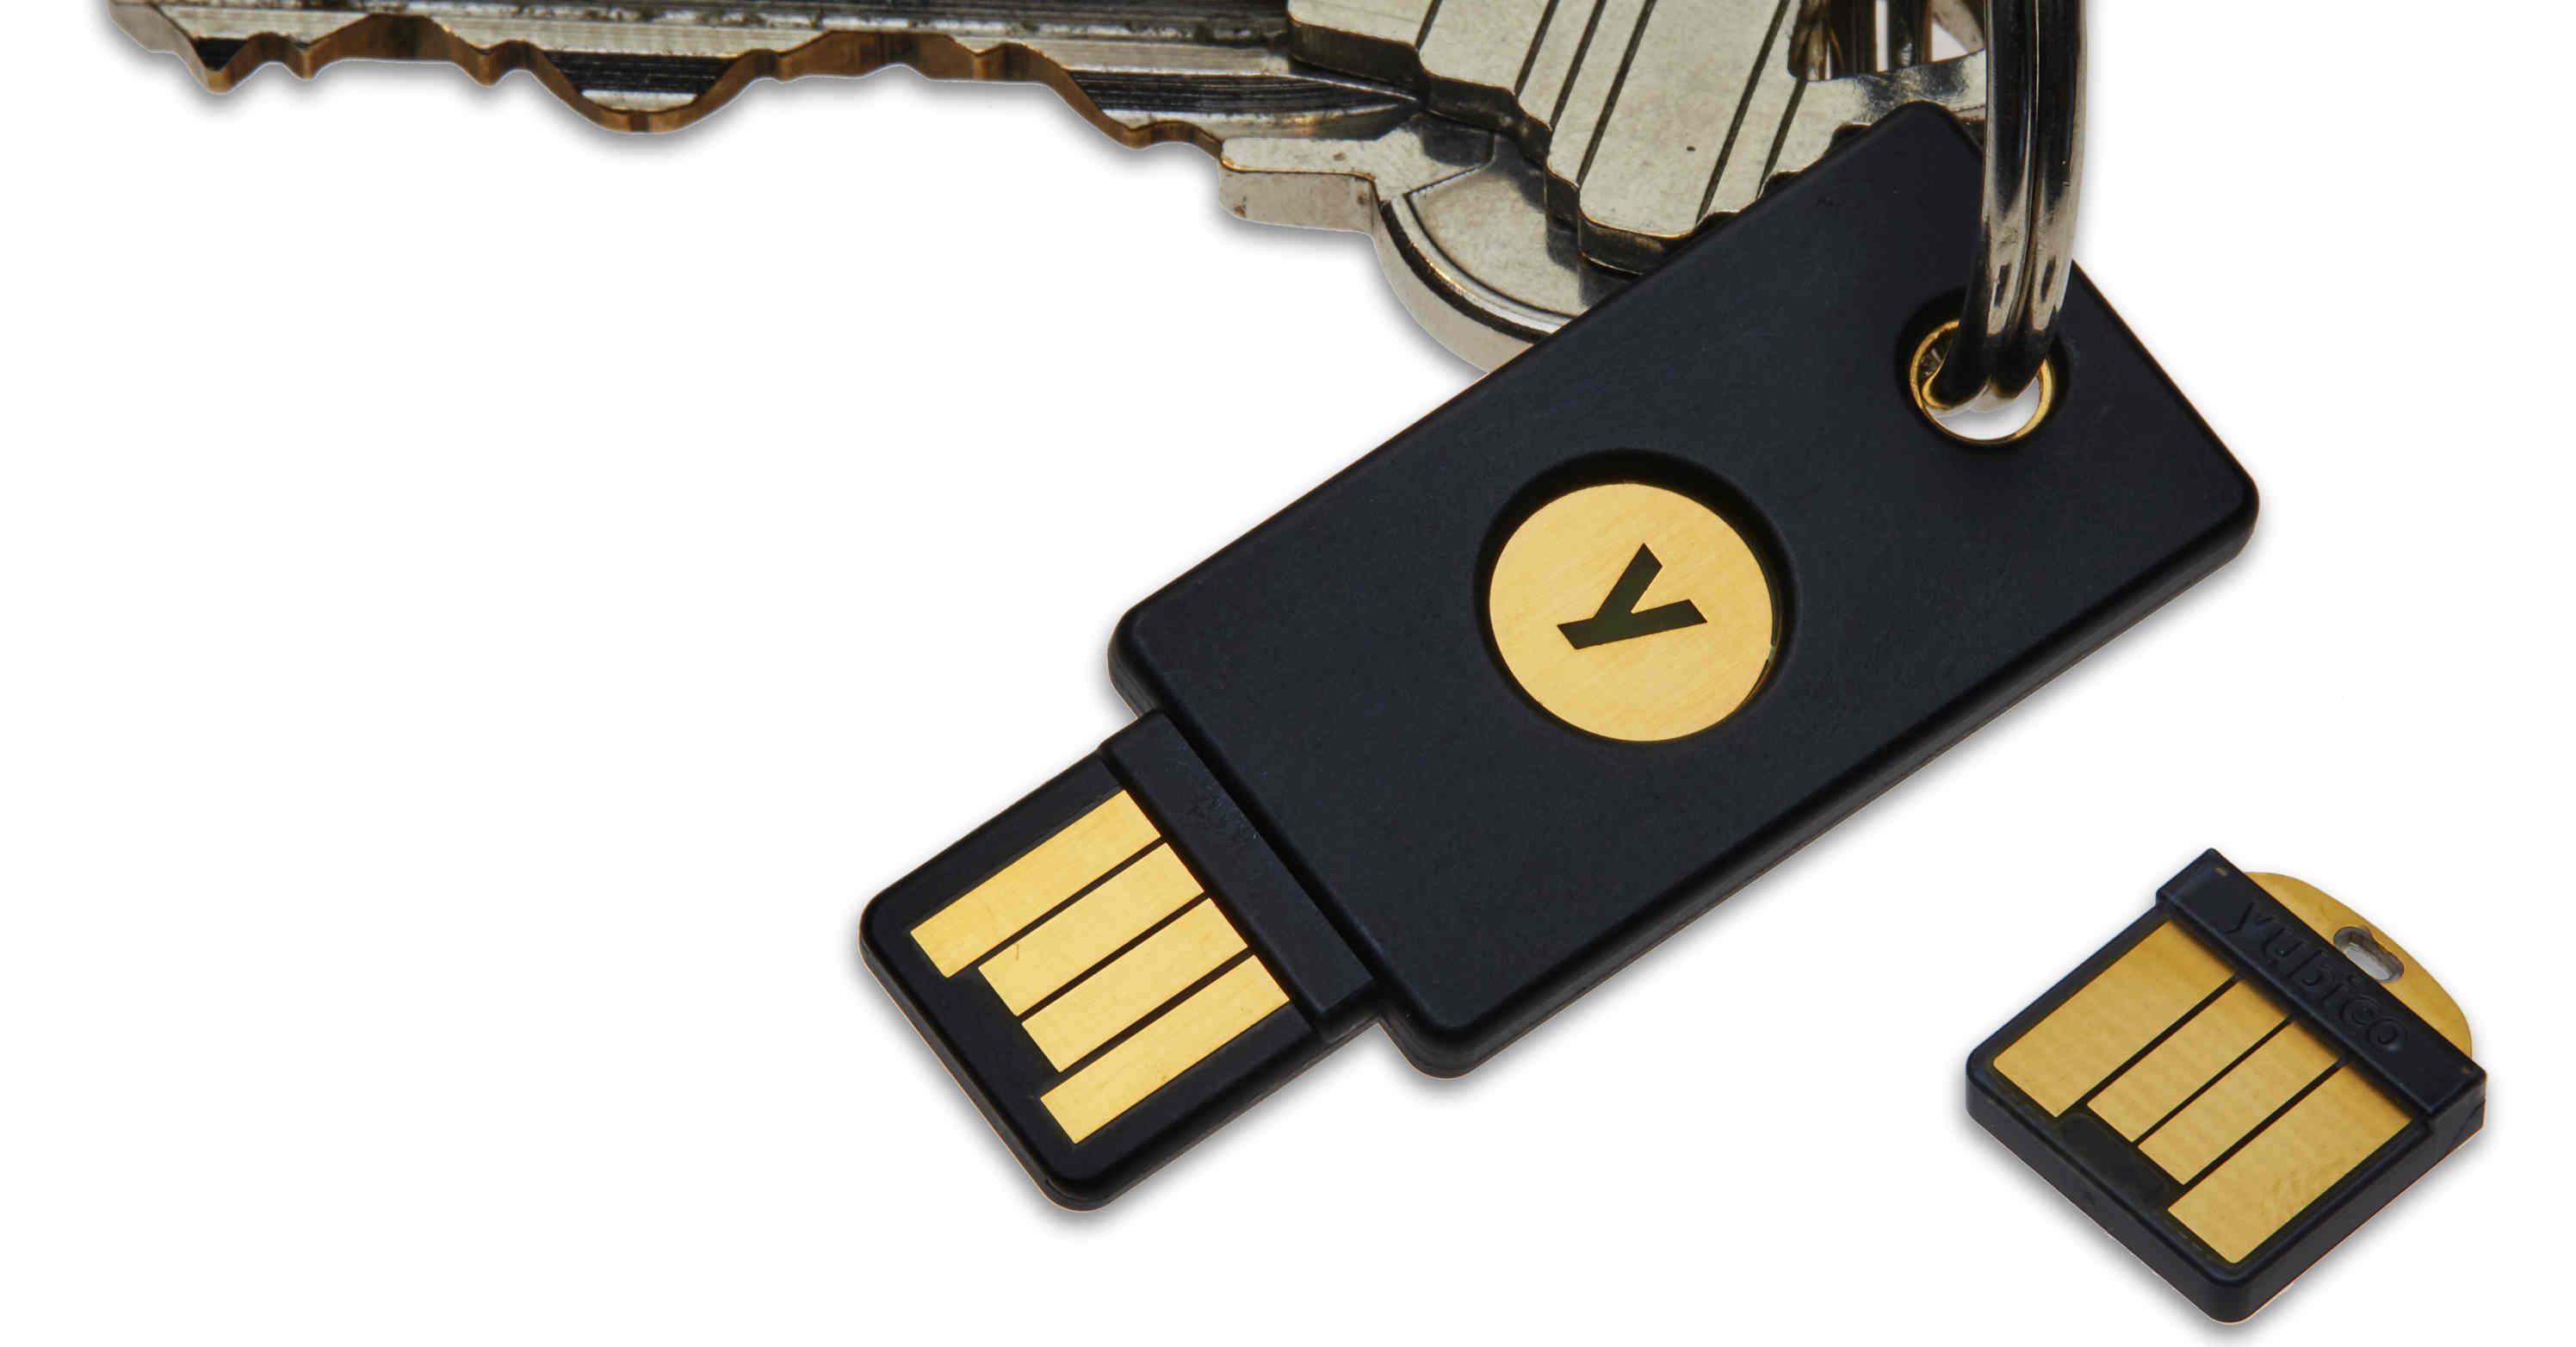 YubiKey 4 keychain and YubiKey 4 Nano